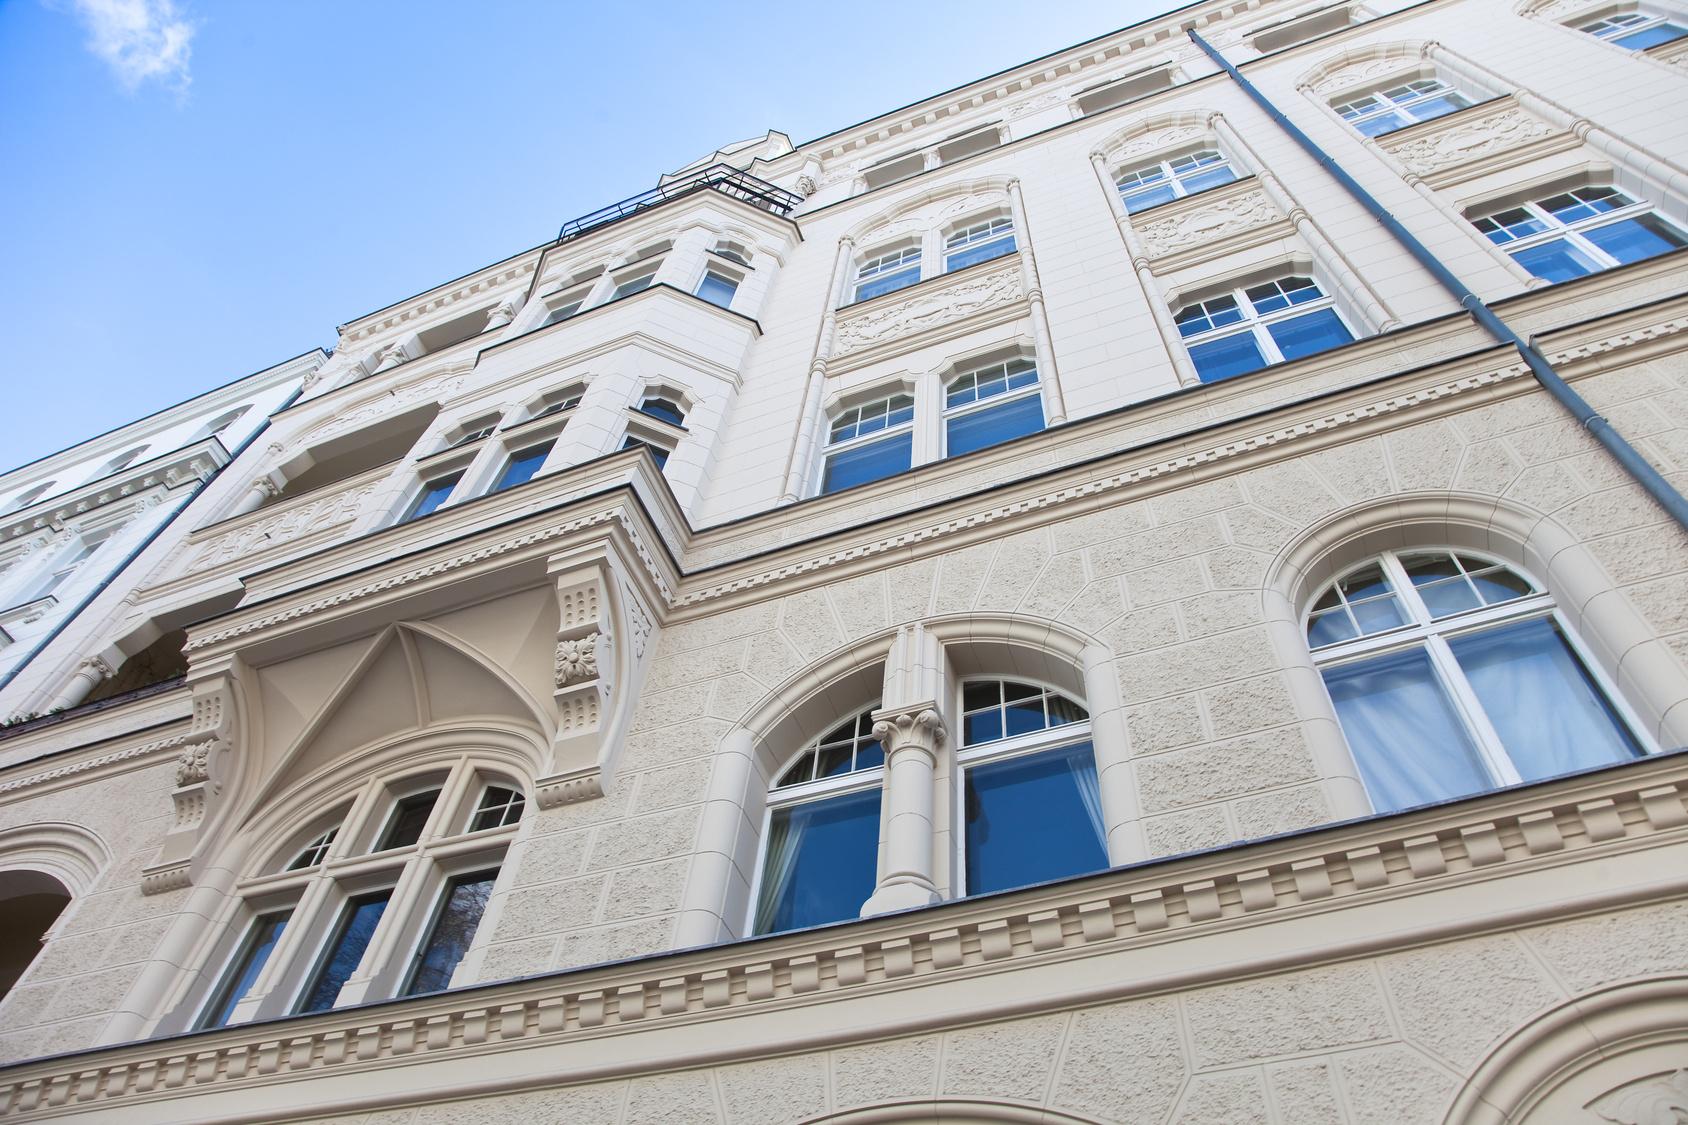 Wohnung - Berlin - Immobilie